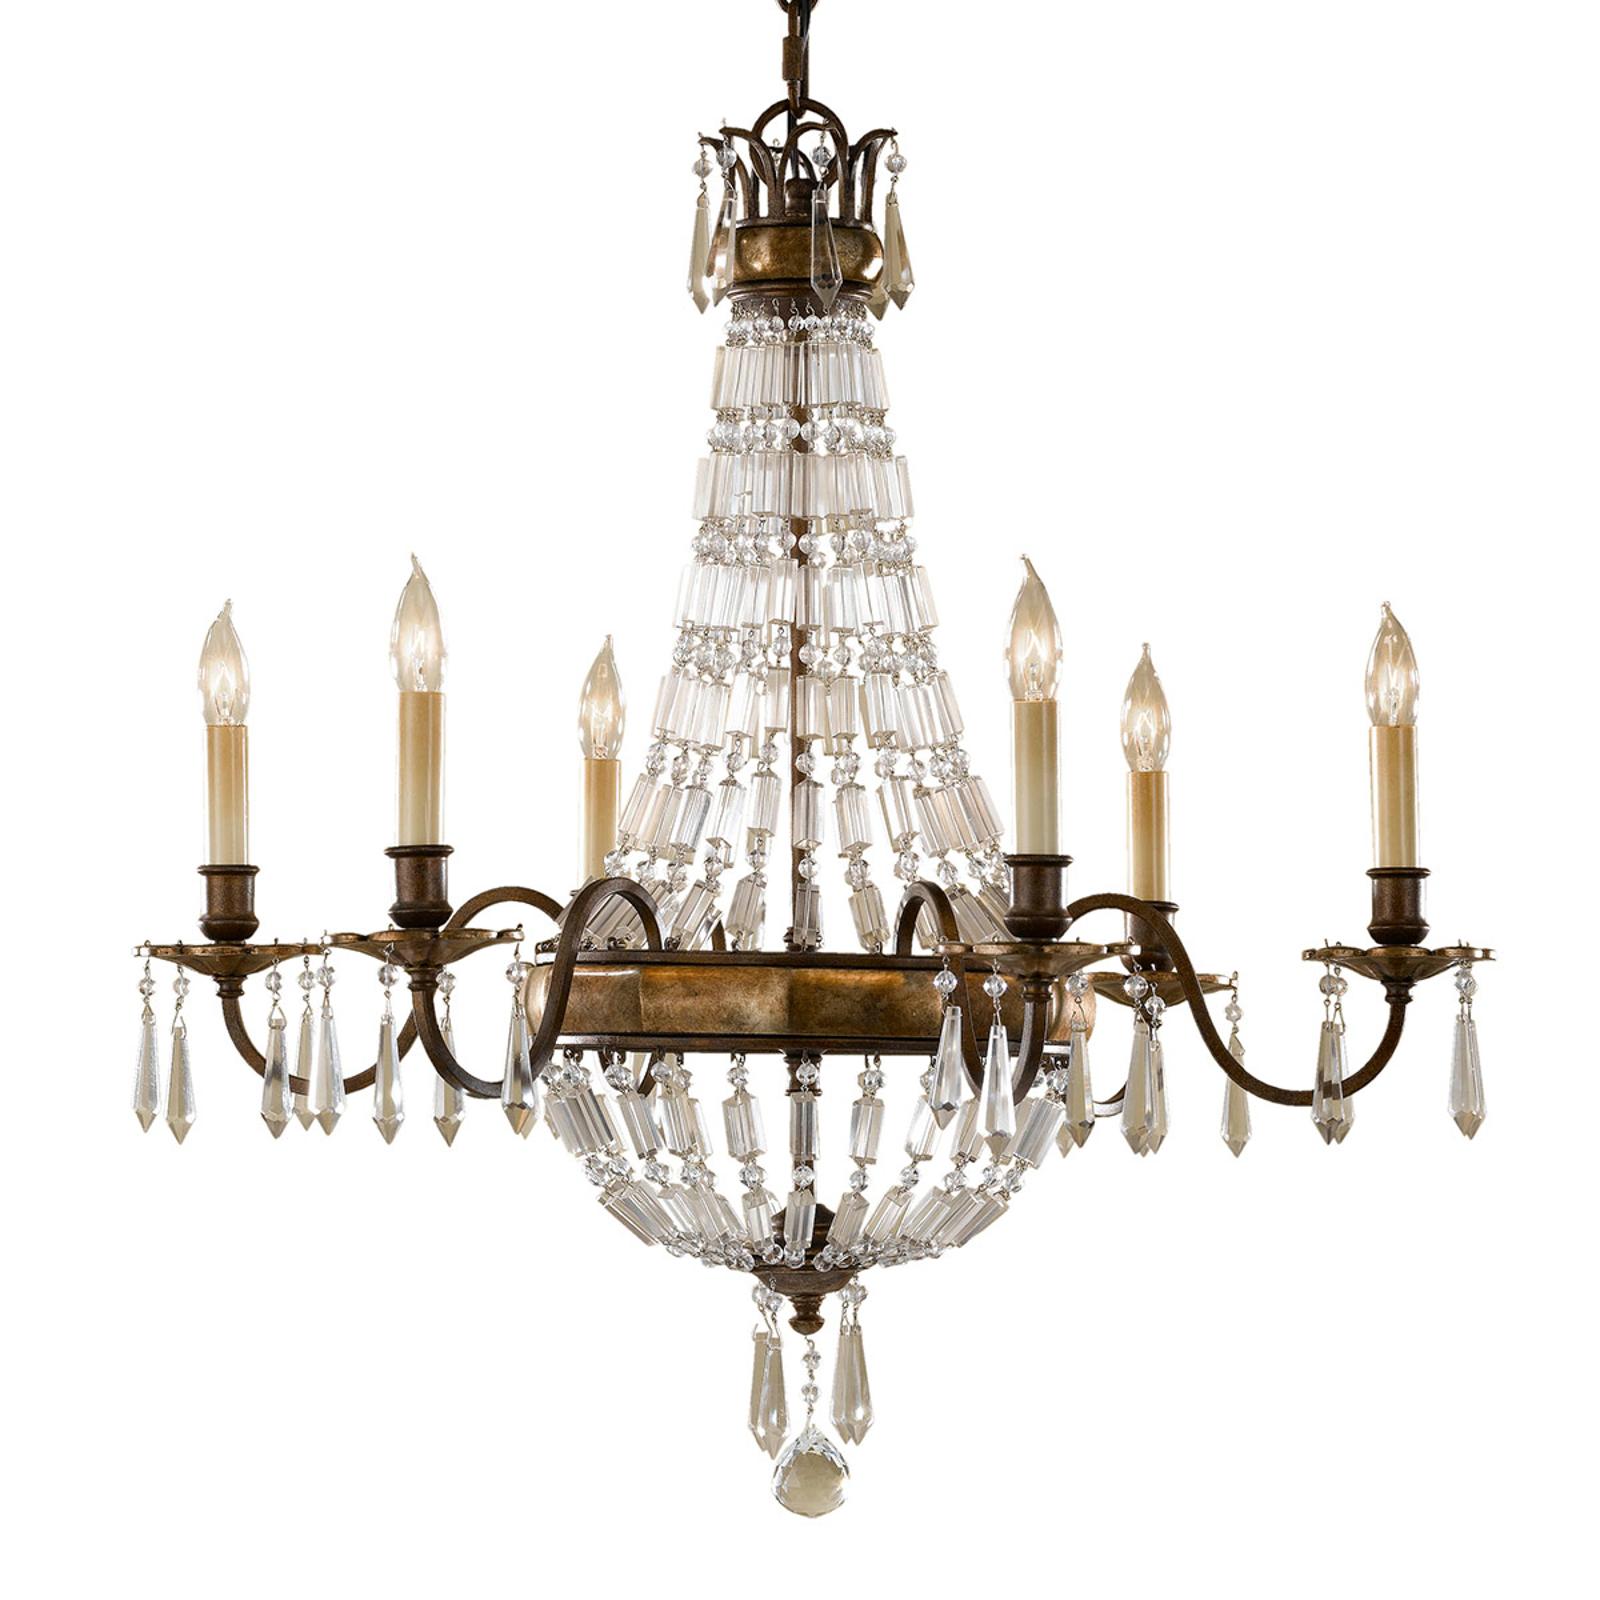 Bellini - lampkrona med antikt utseende